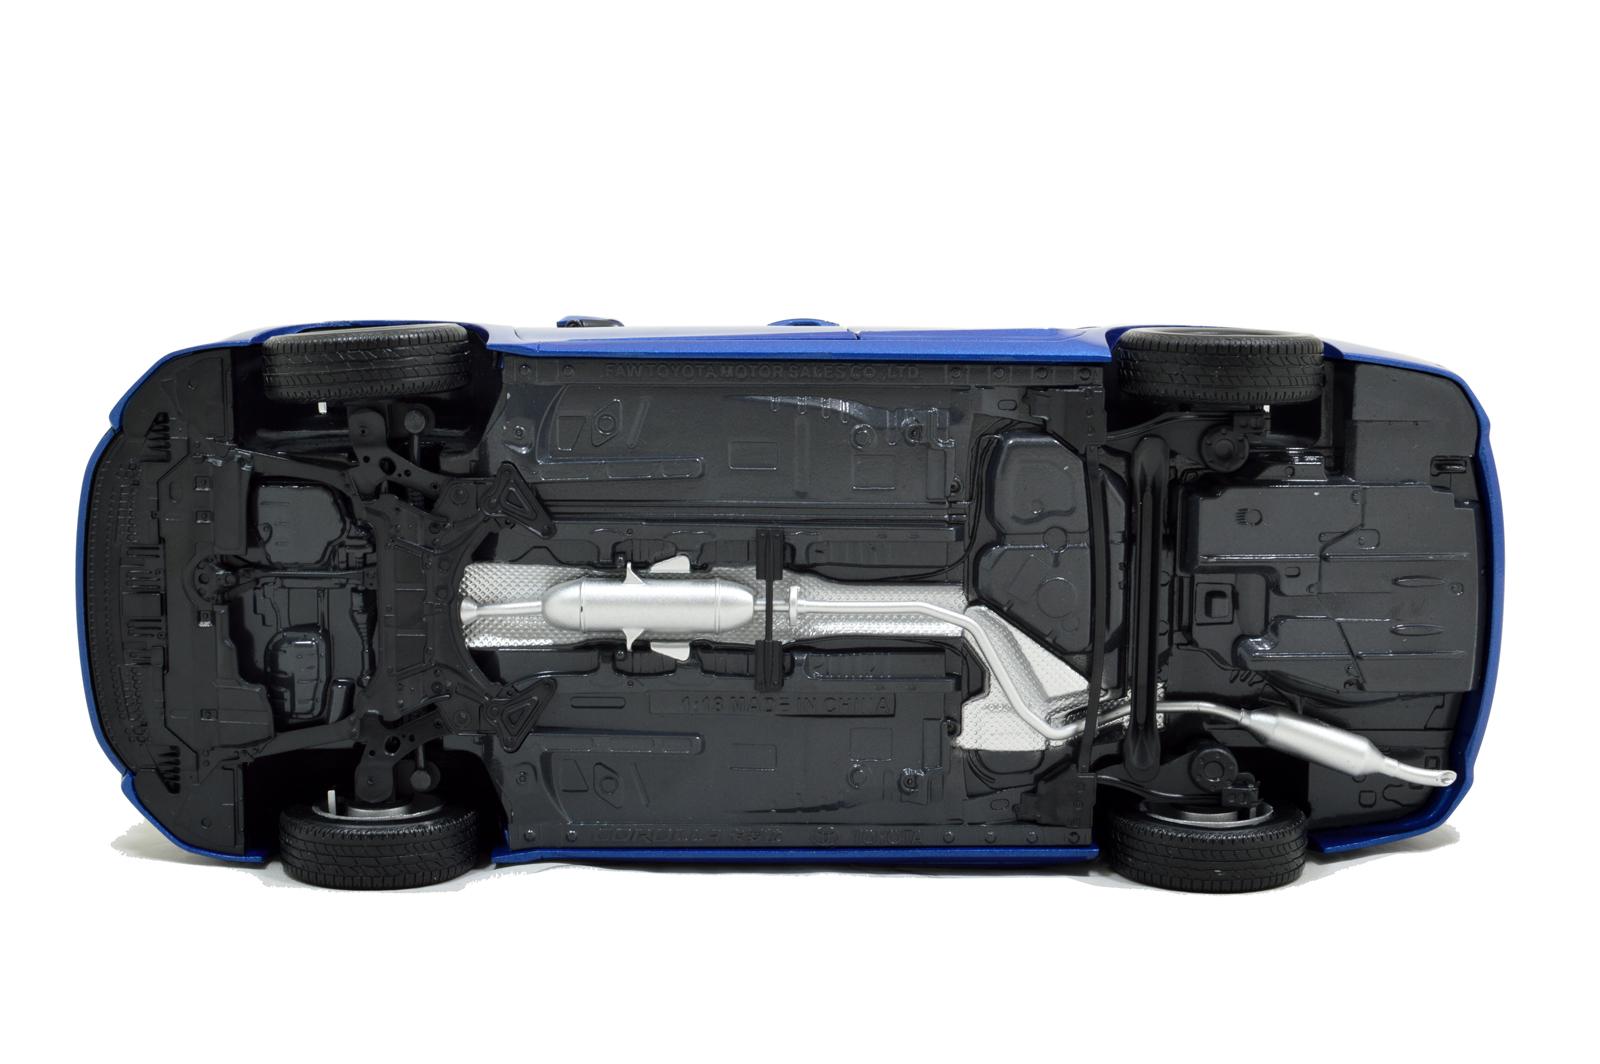 Toyota Corolla 2014 1/18 Scale Diecast Model Car Wholesale 13